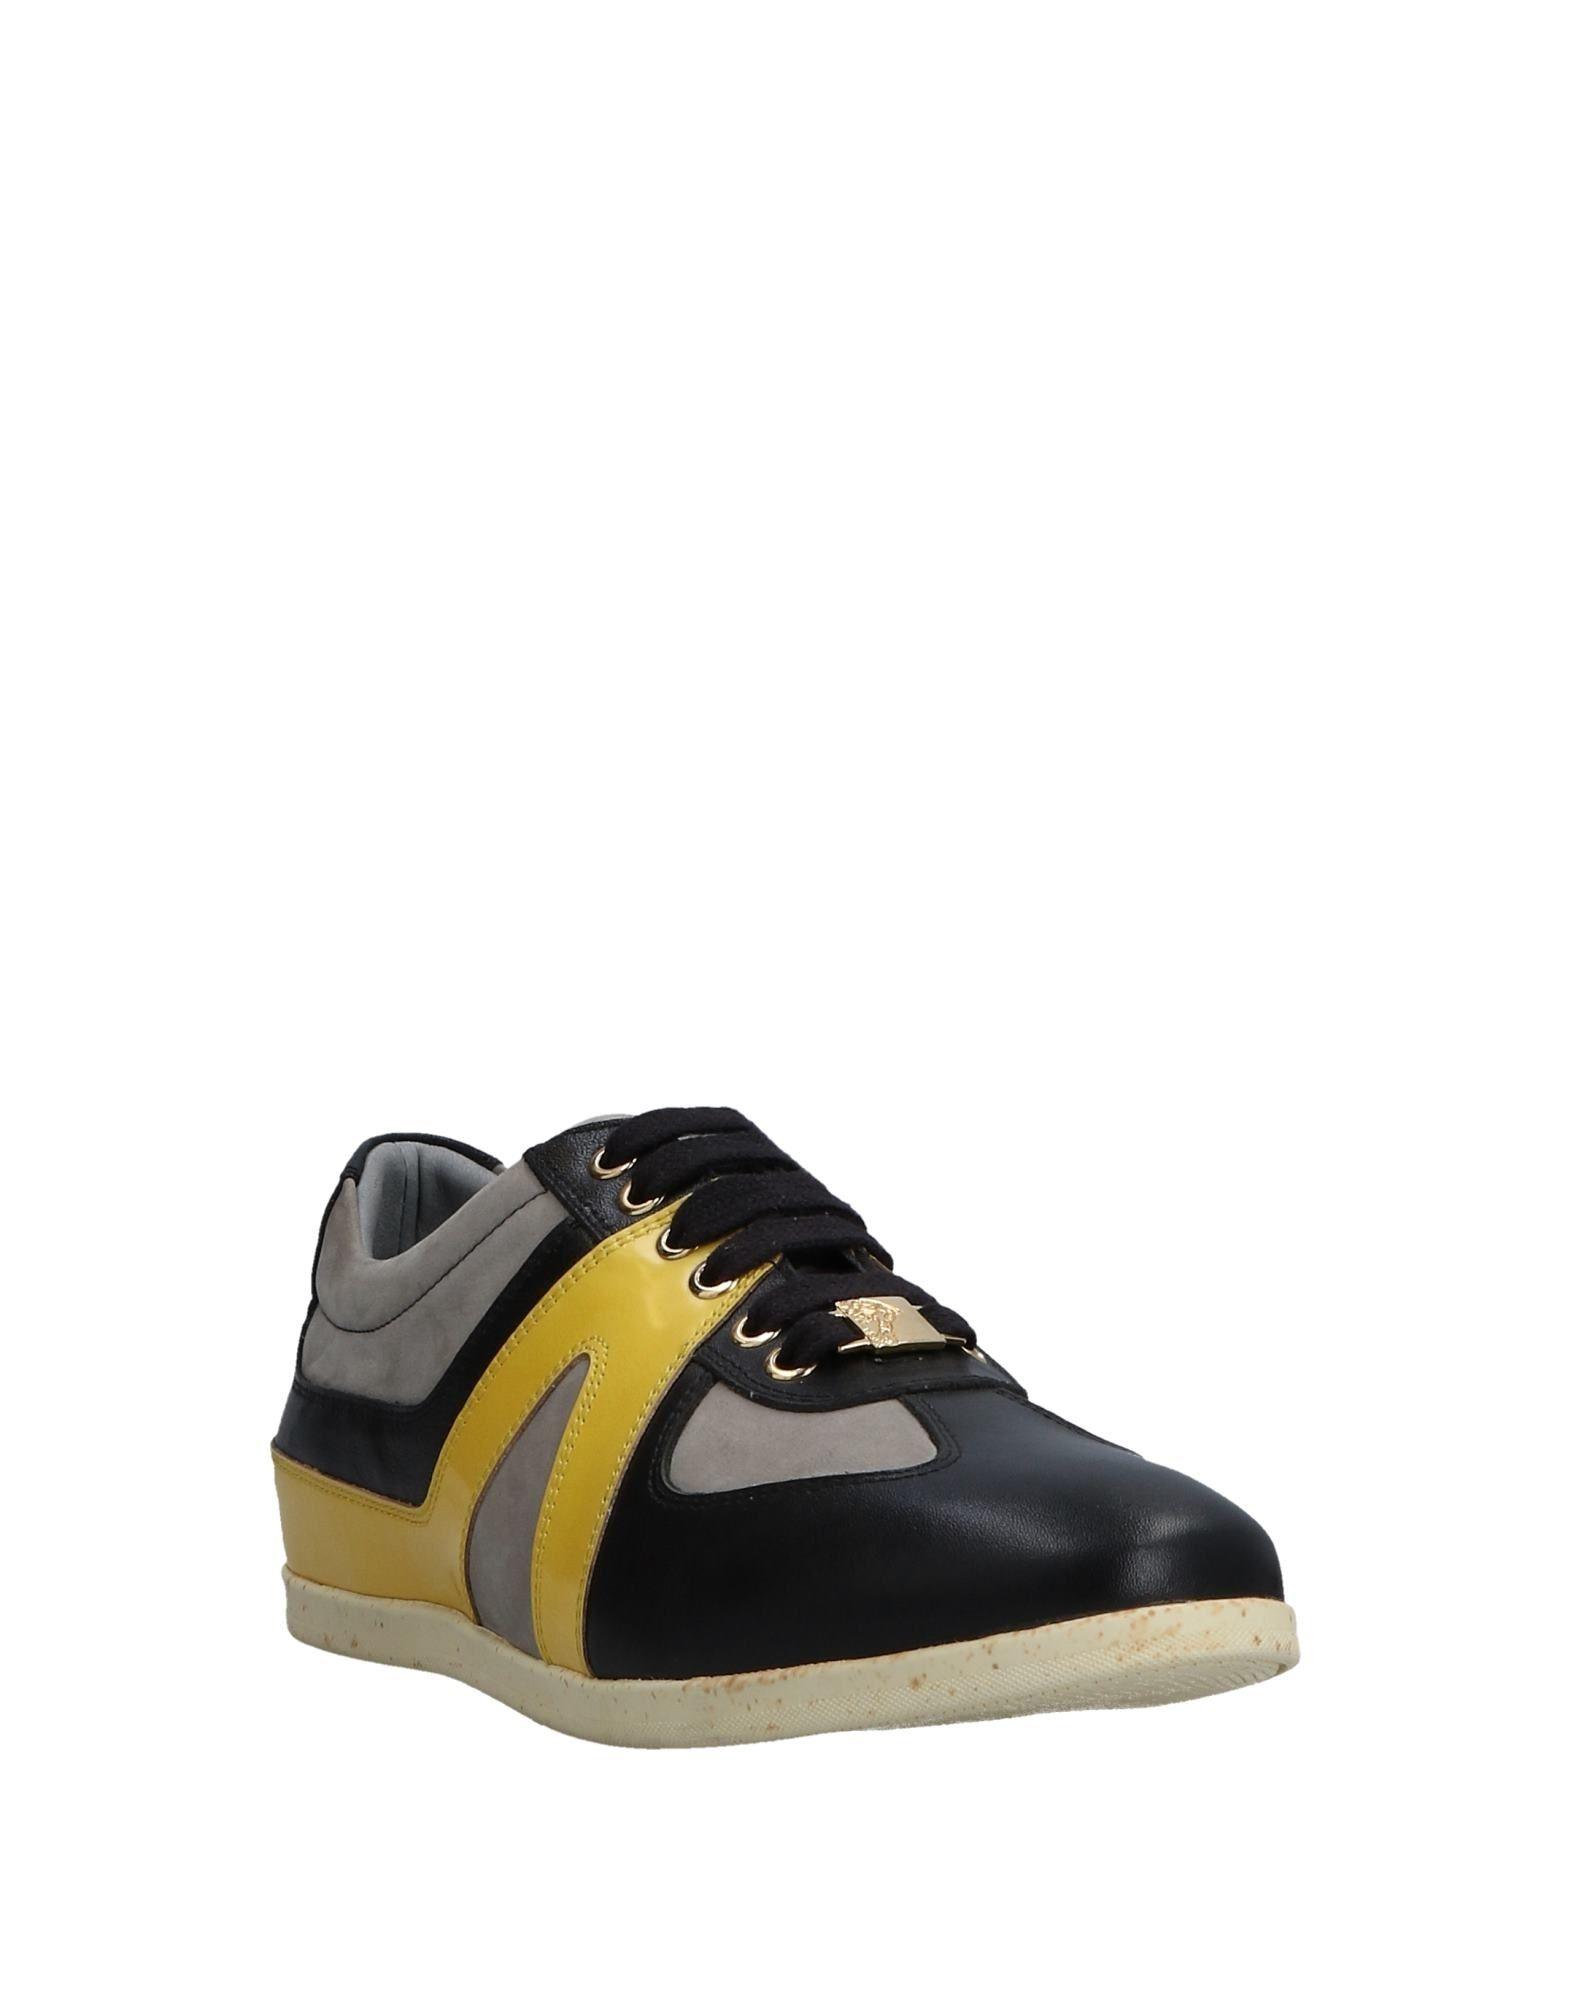 Stilvolle billige Damen Schuhe Versace Collection Sneakers Damen billige  11532924AX abfefb